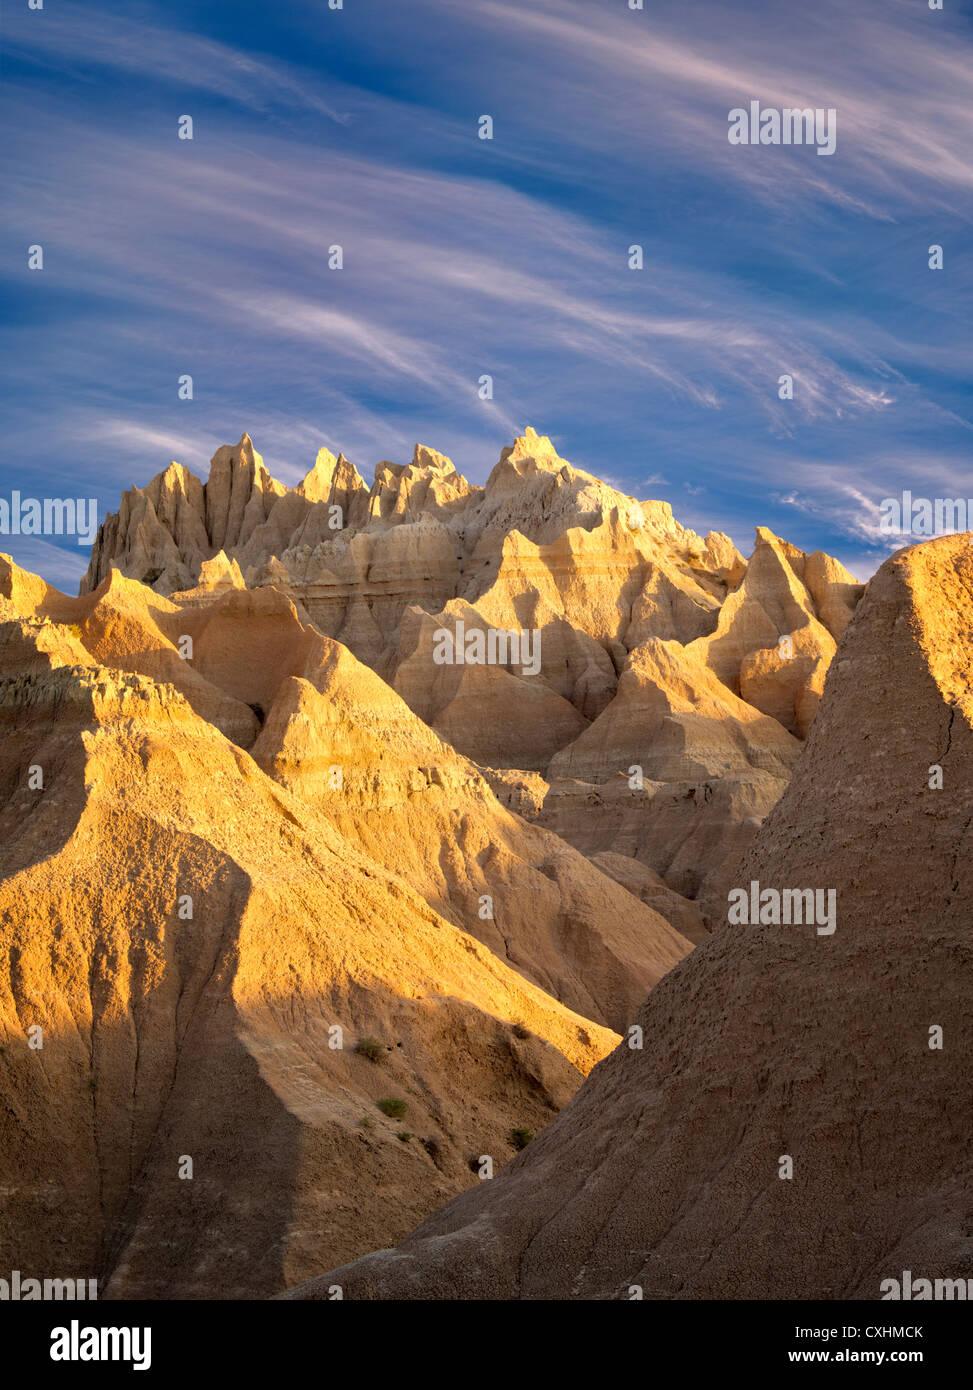 Ausgewaschene Felsformationen. Badlands Nationalpark. South Dakota Stockbild